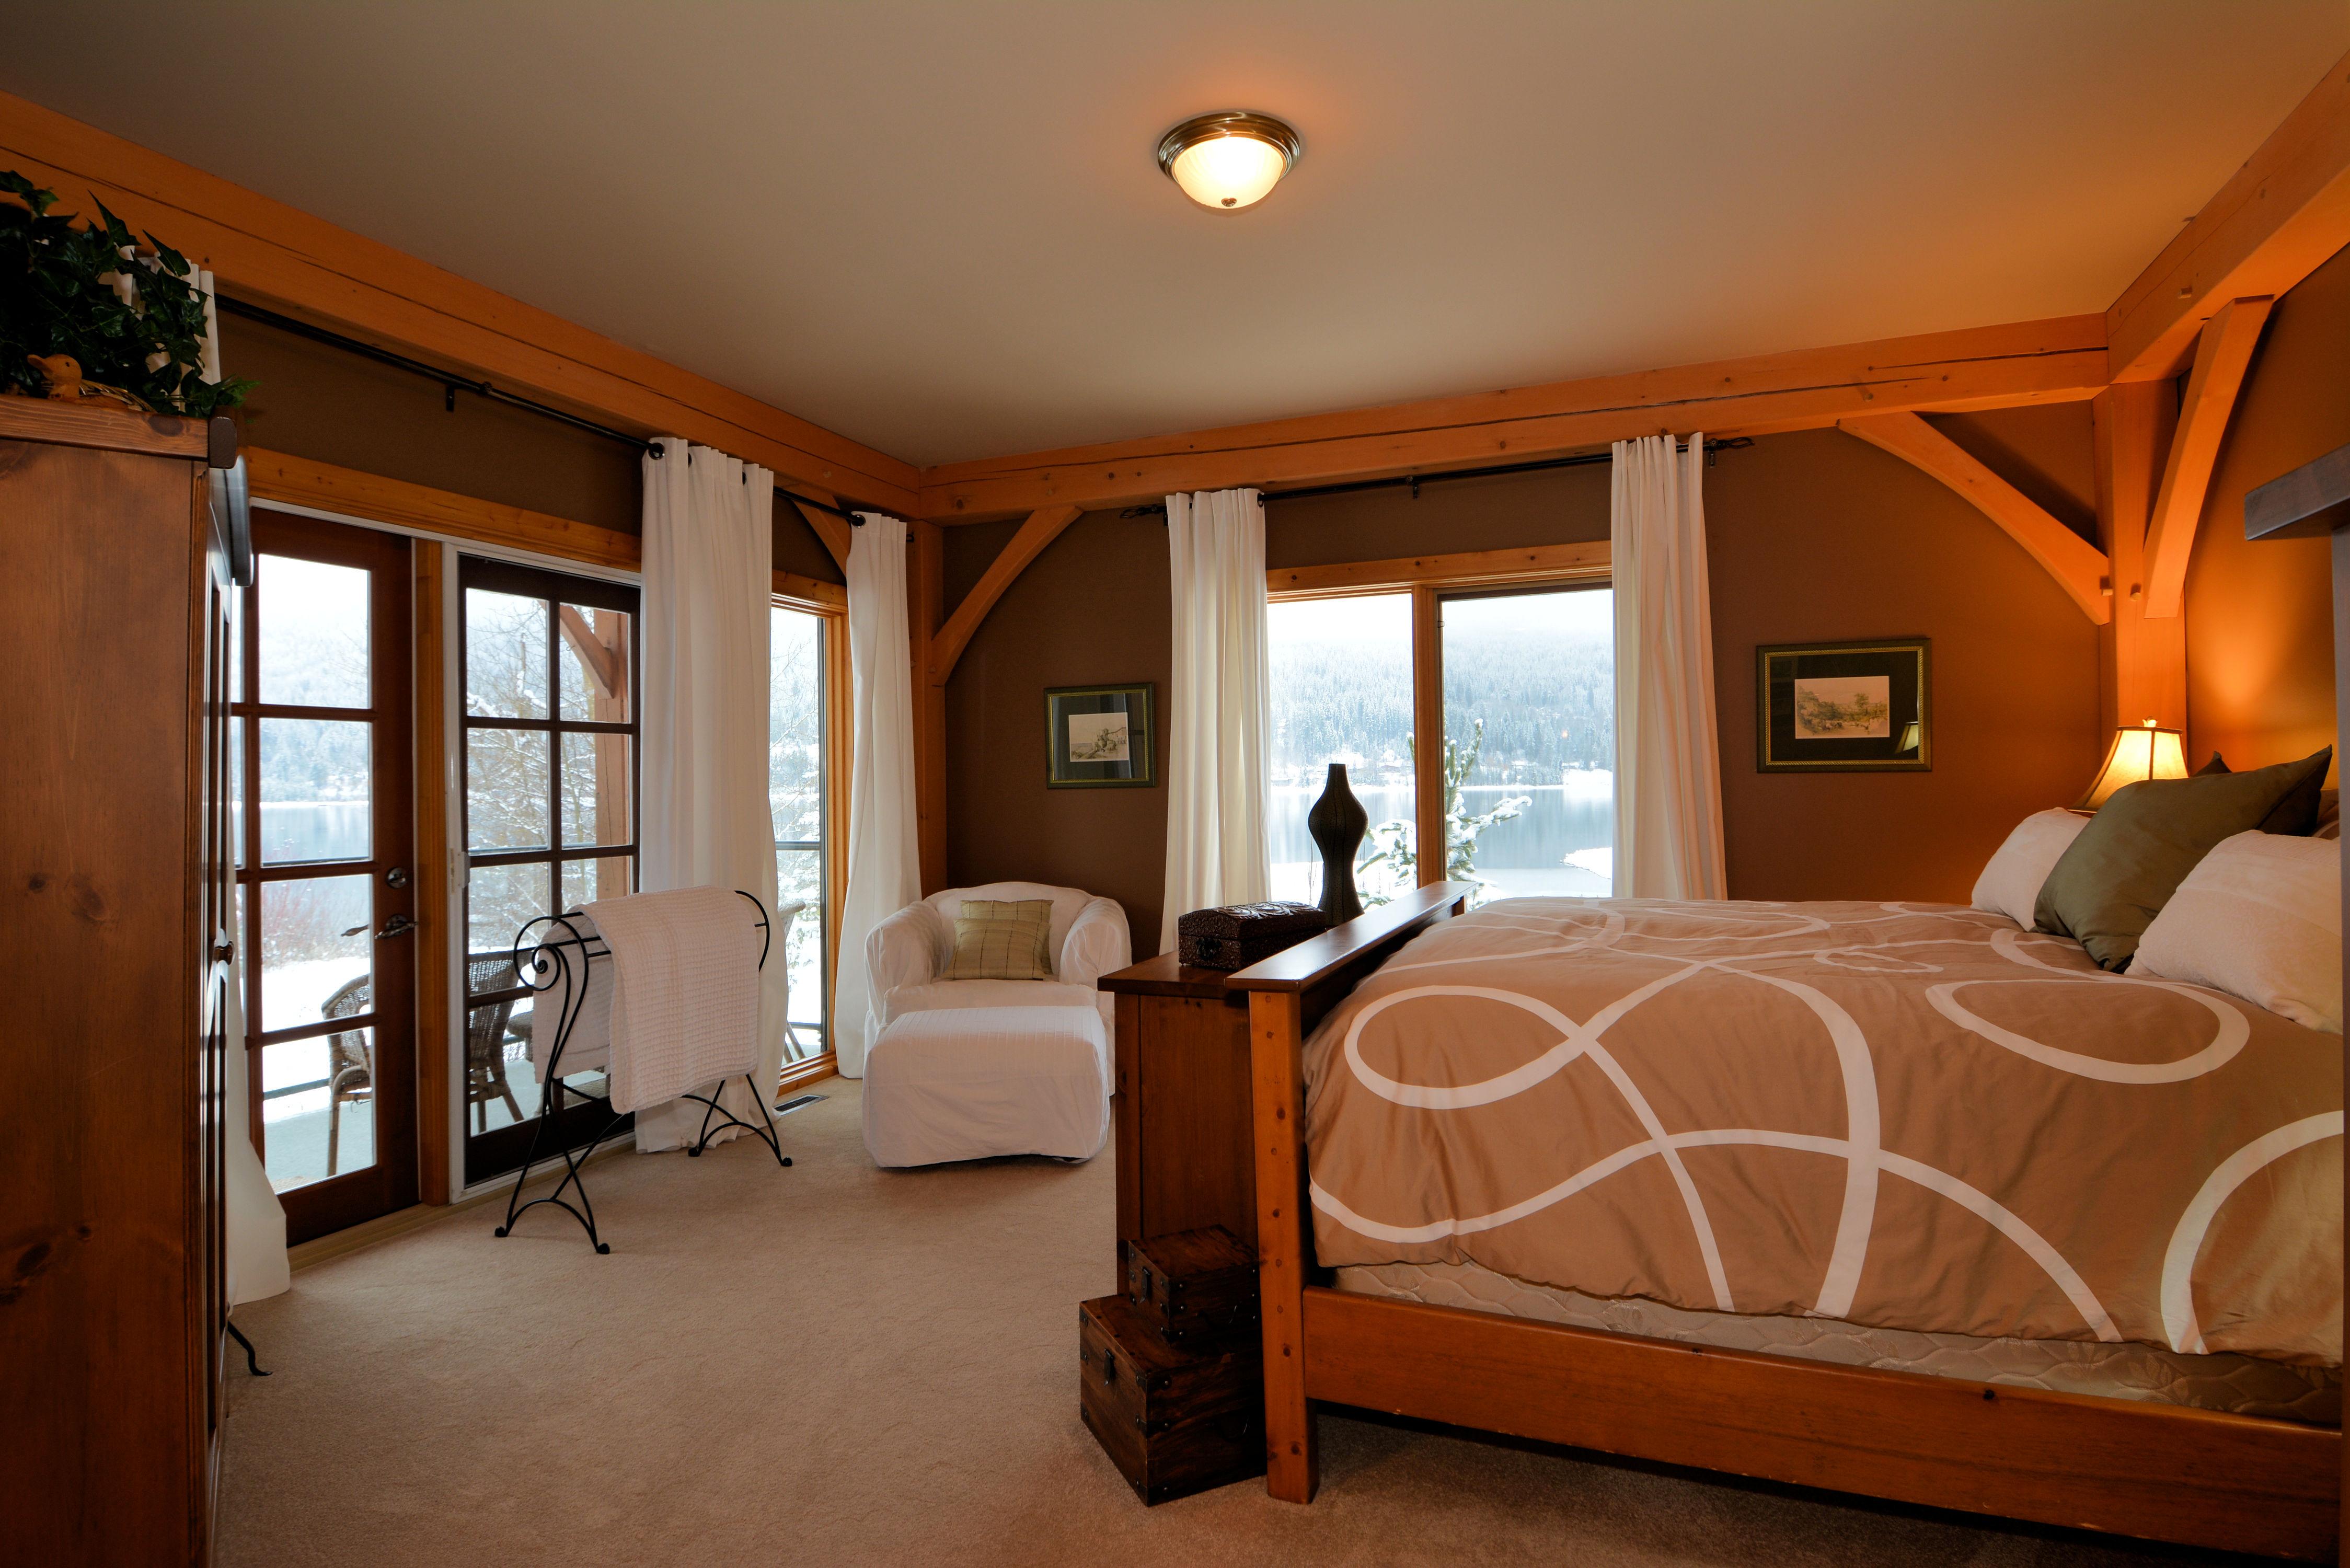 Master Bedroom: 15'  x16'